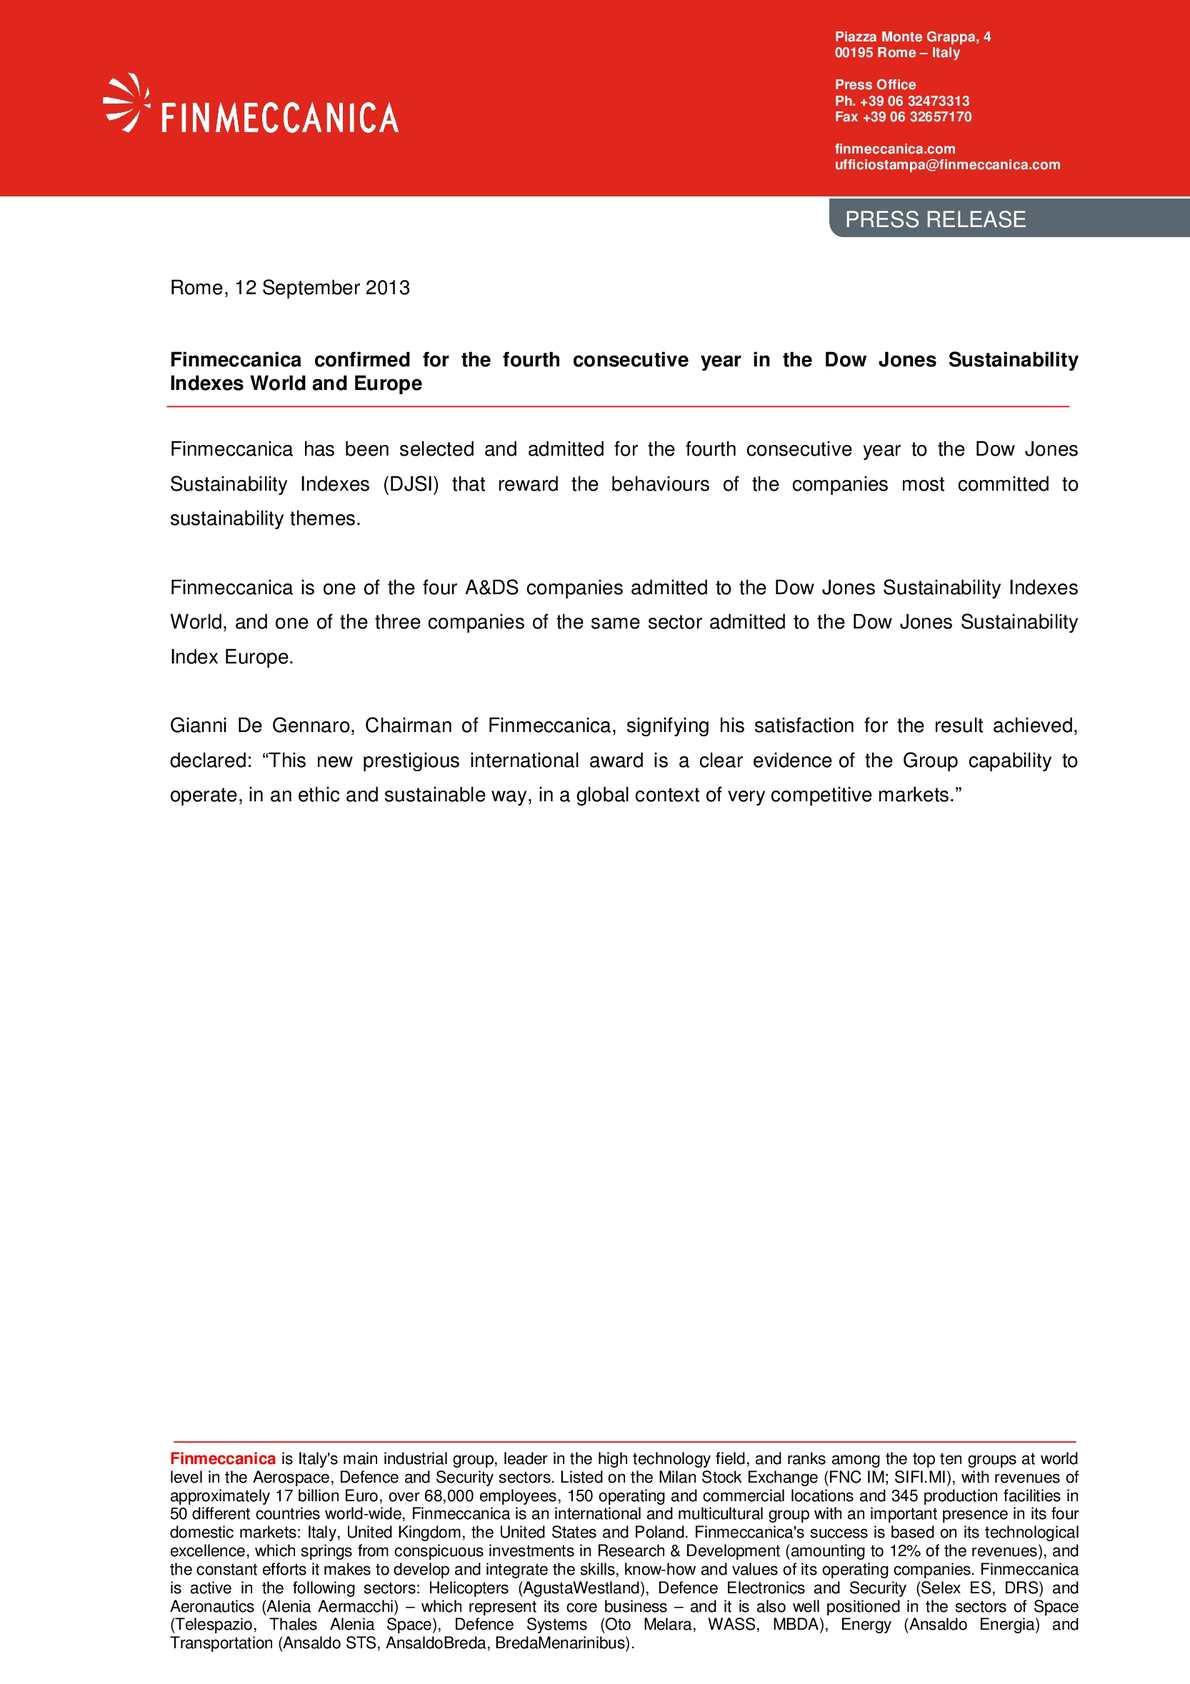 Calaméo - Finmeccanica confirmed for the fourth consecutive